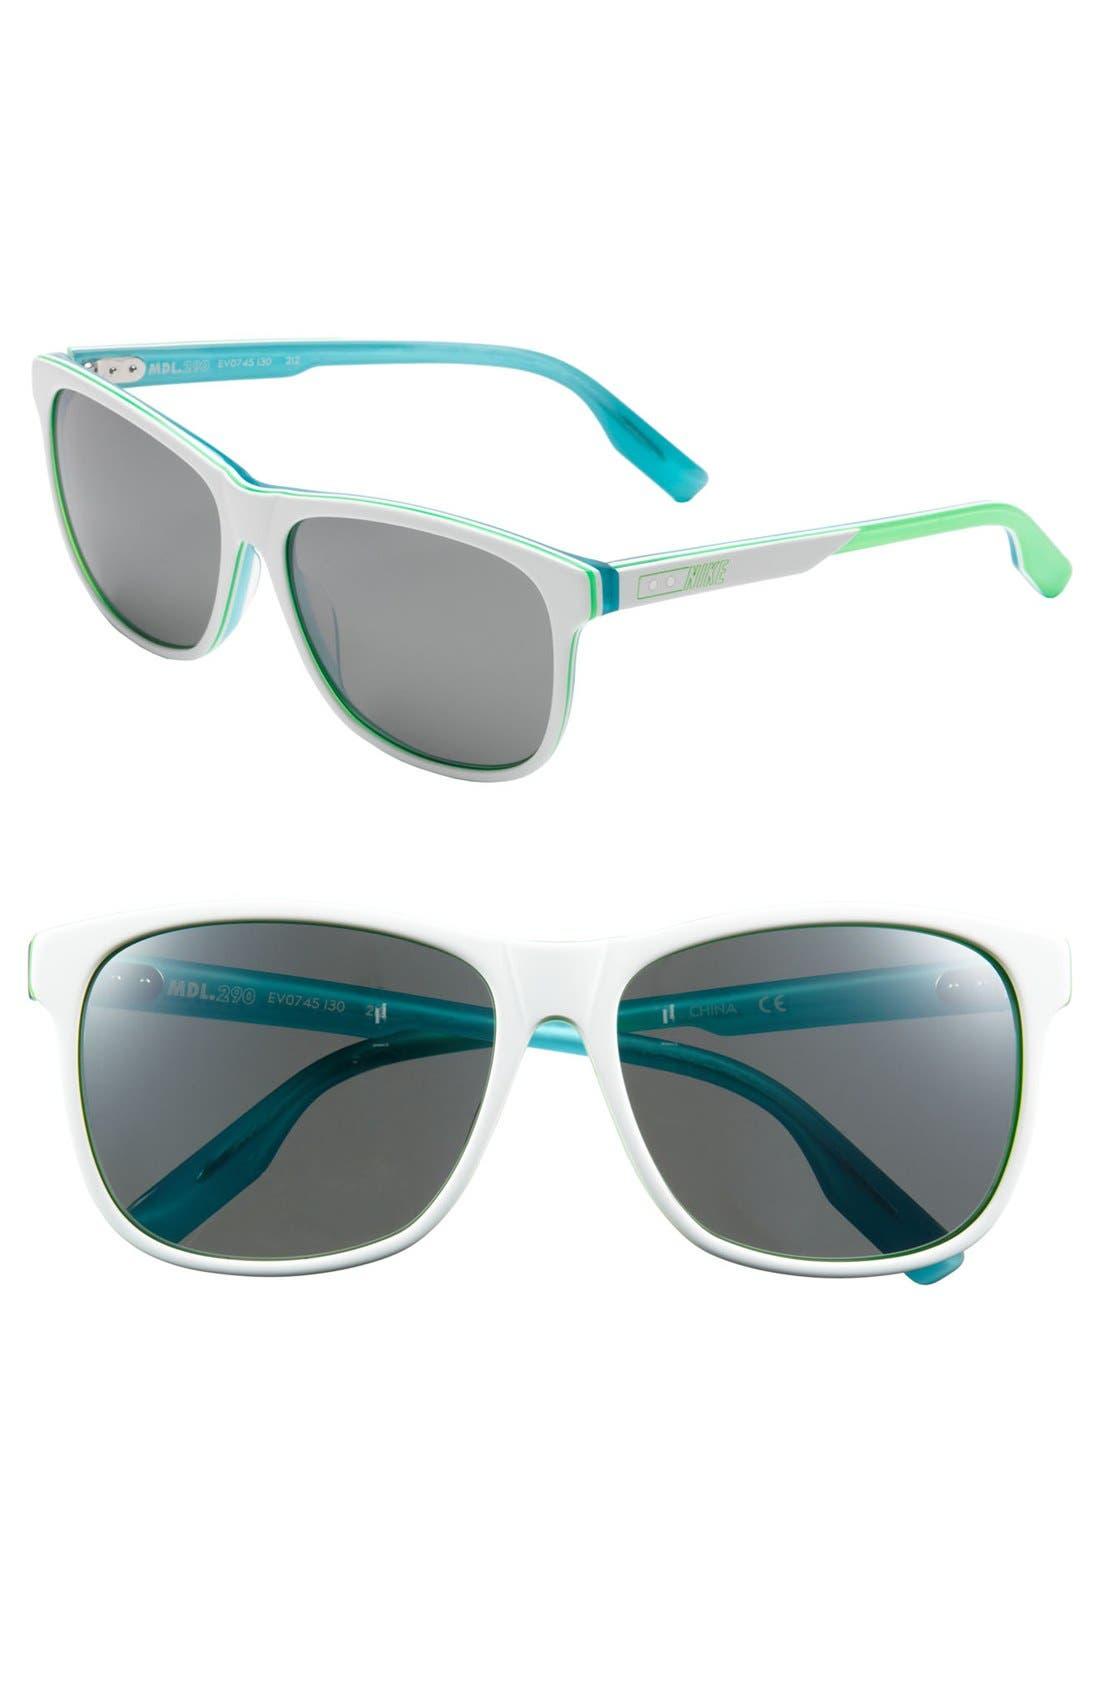 Main Image - Nike 'MDL. 290' 58mm Sunglasses